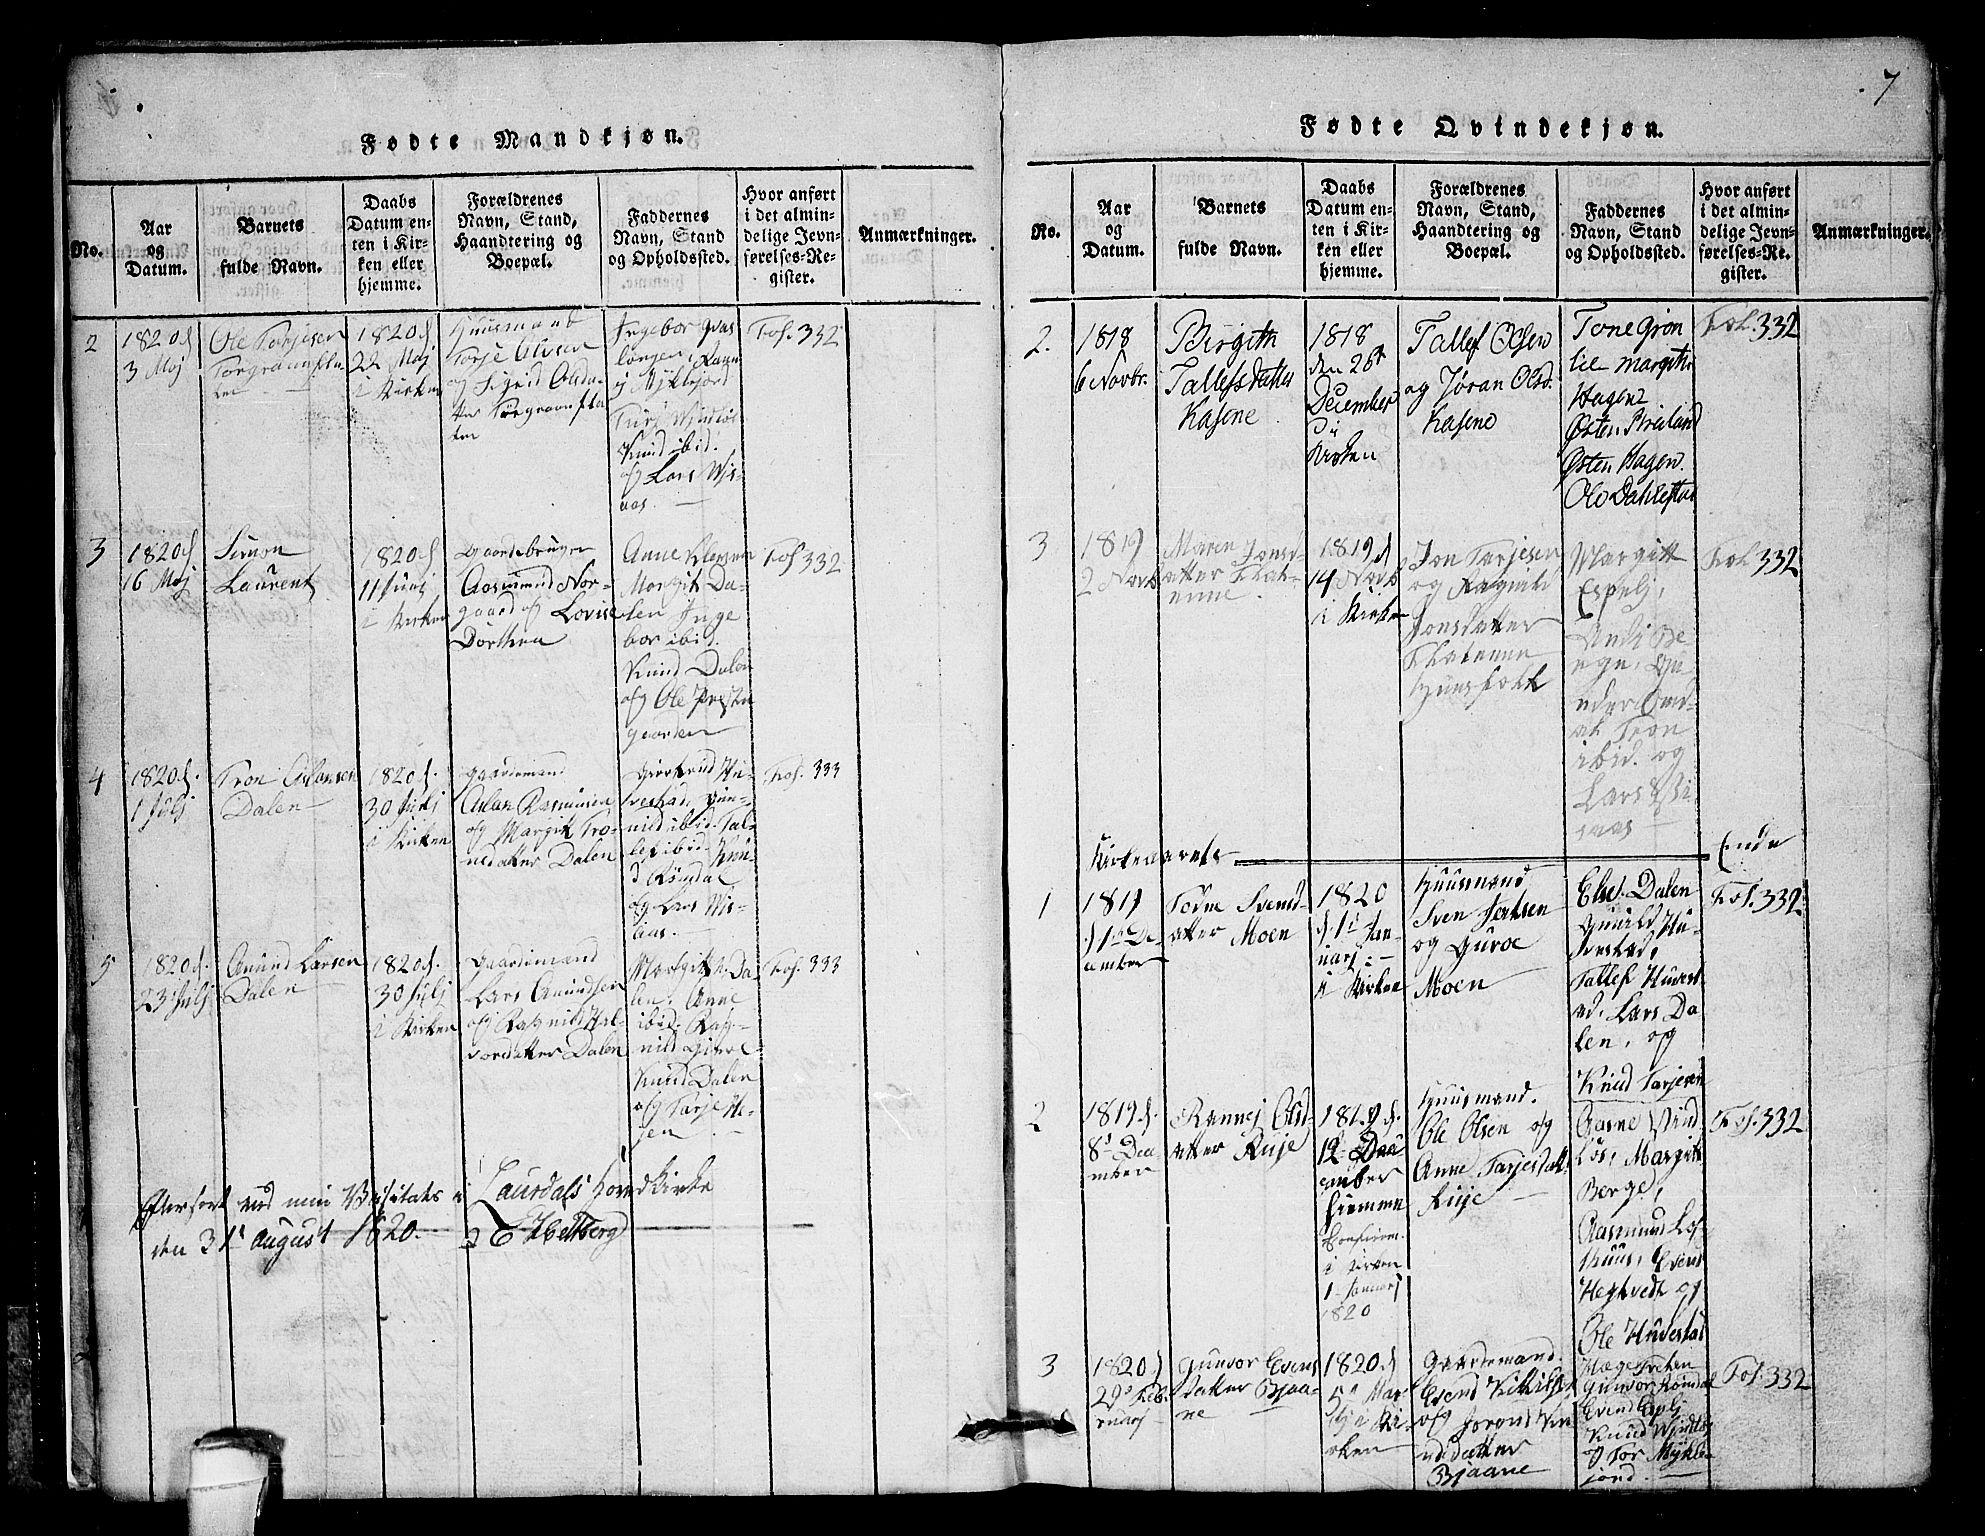 SAKO, Lårdal kirkebøker, G/Gb/L0001: Klokkerbok nr. II 1, 1815-1865, s. 7